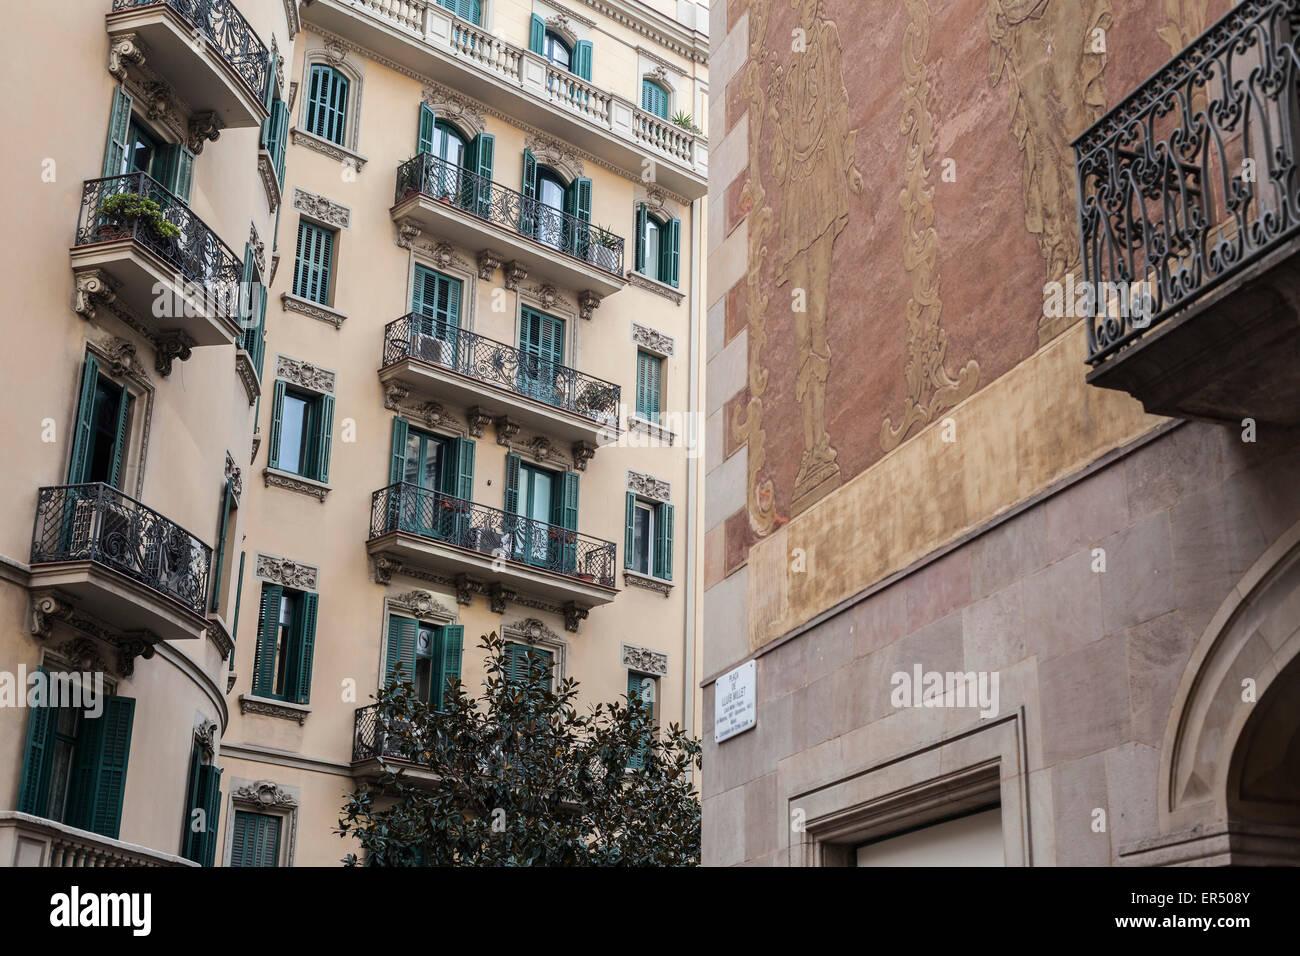 Barcelona. Facade building in Ciutat Vella - Stock Image